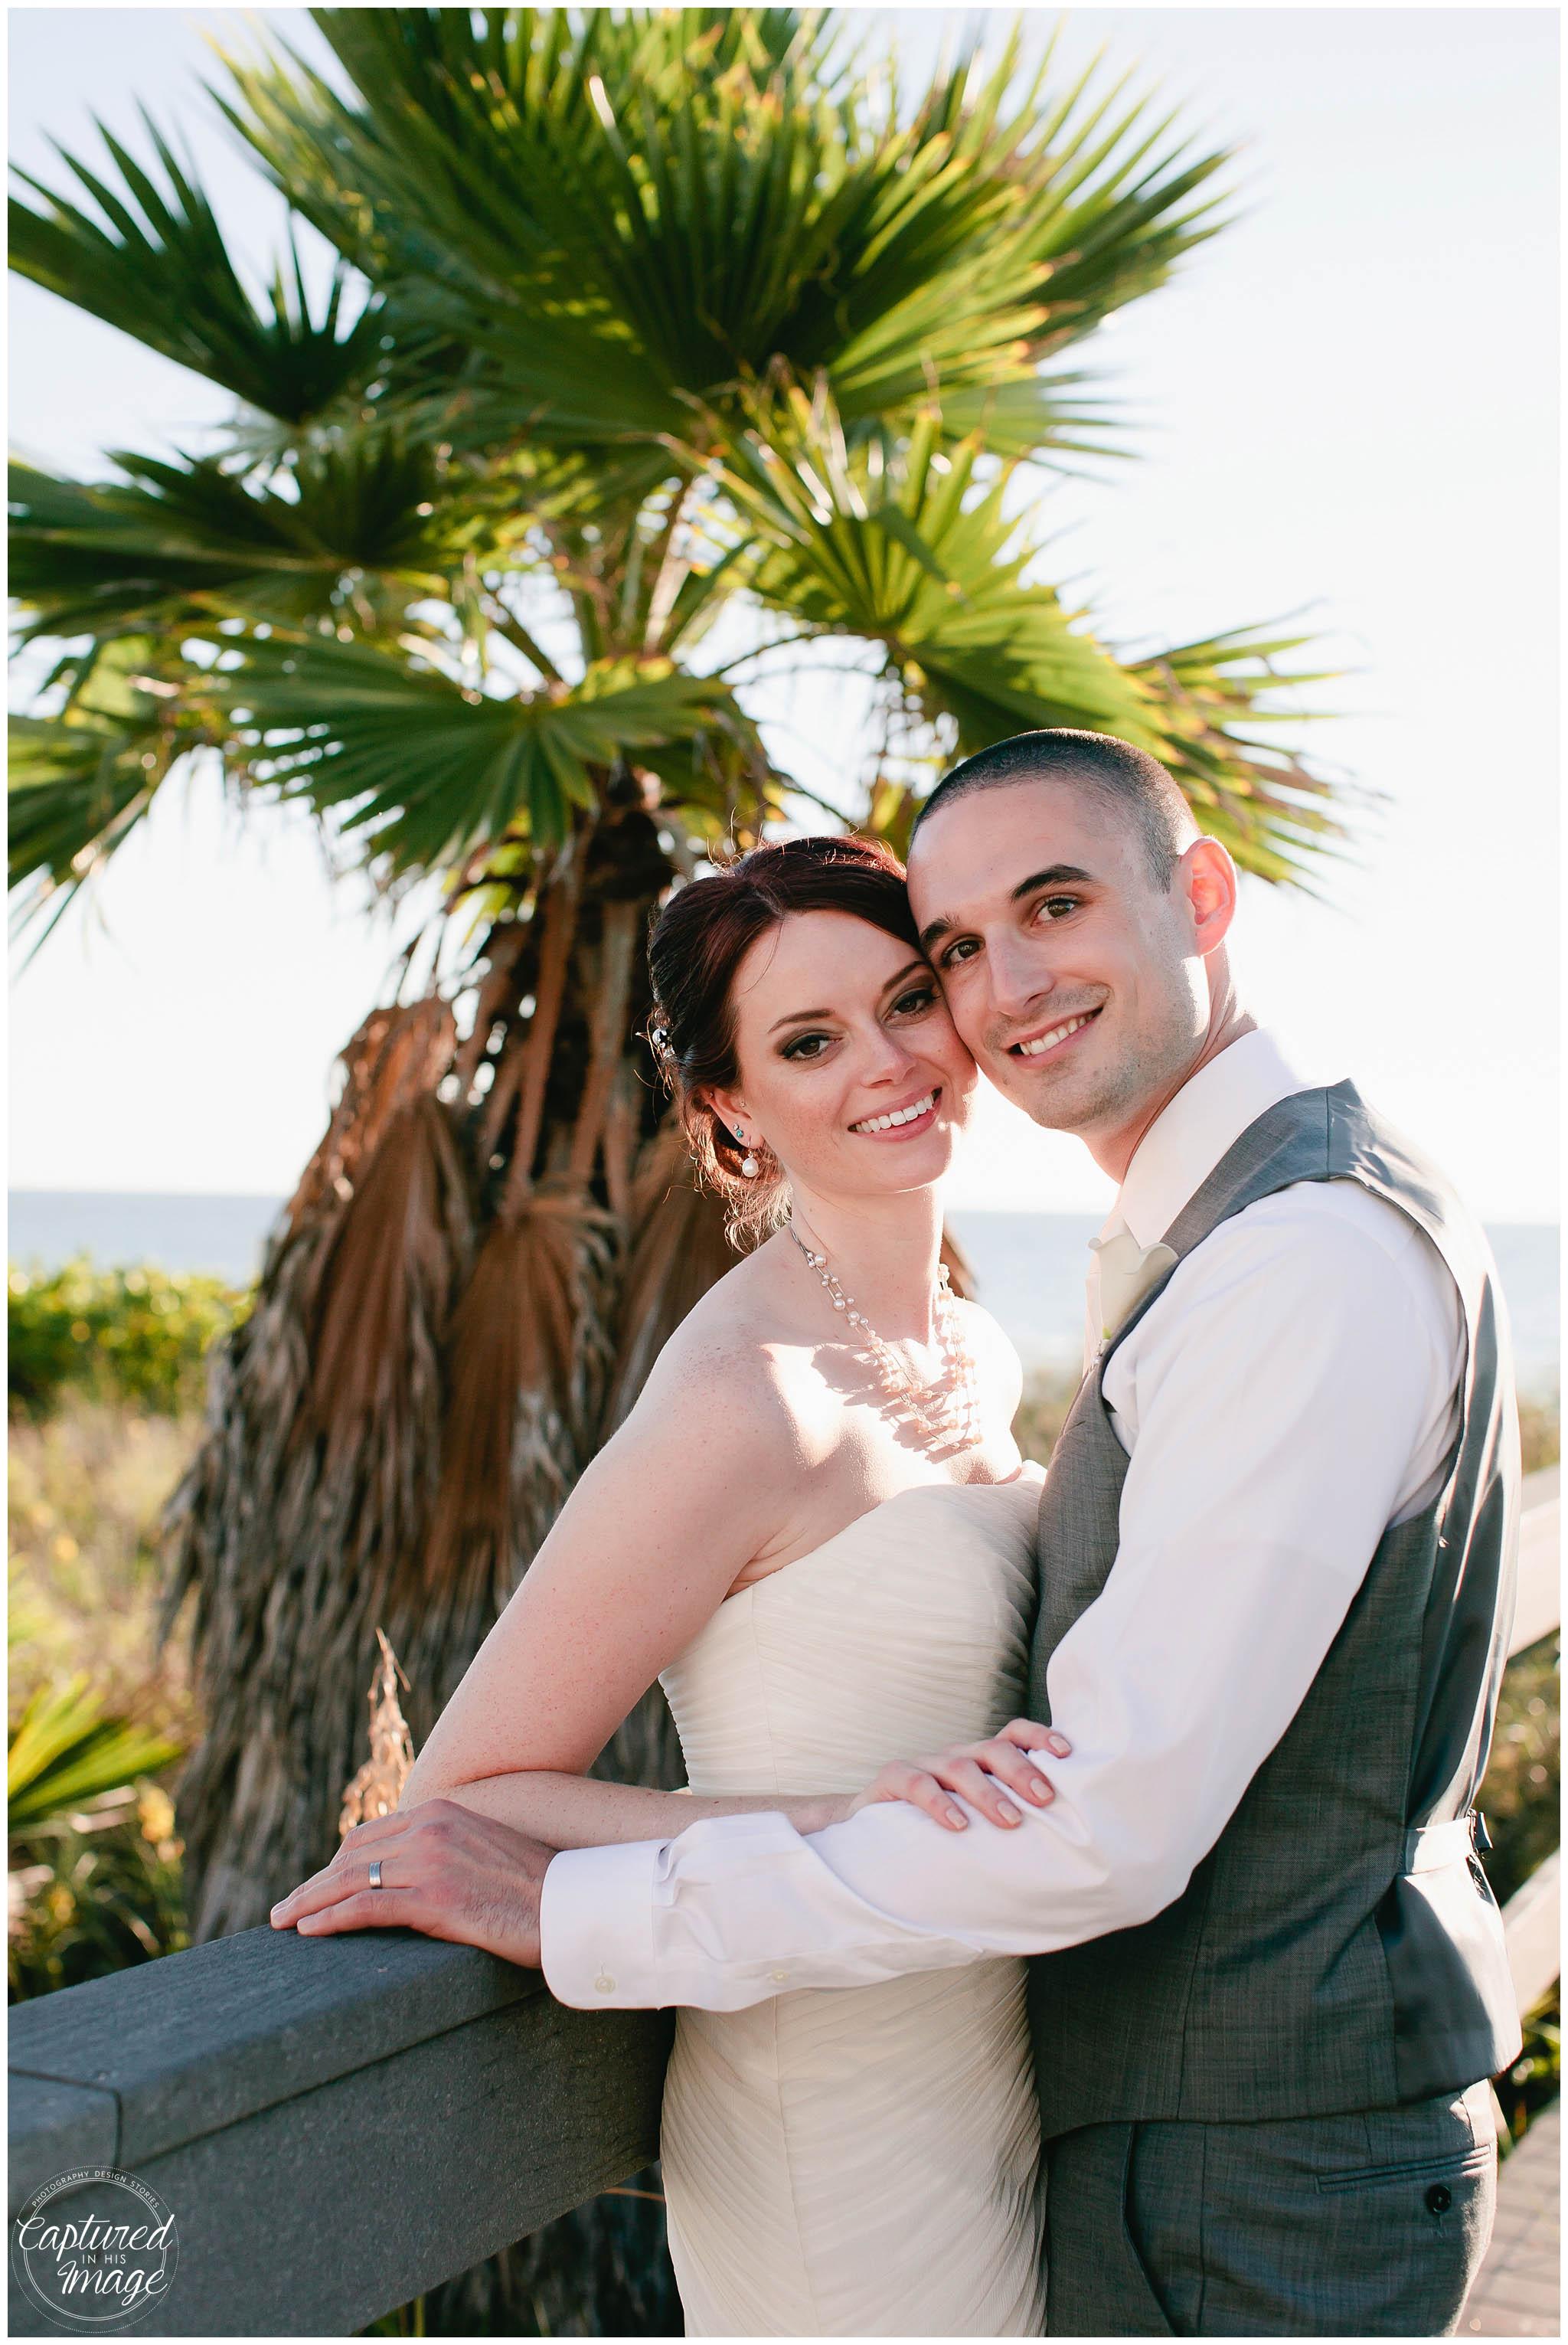 St. Pete Beach Destination Wedding (37 of 81)